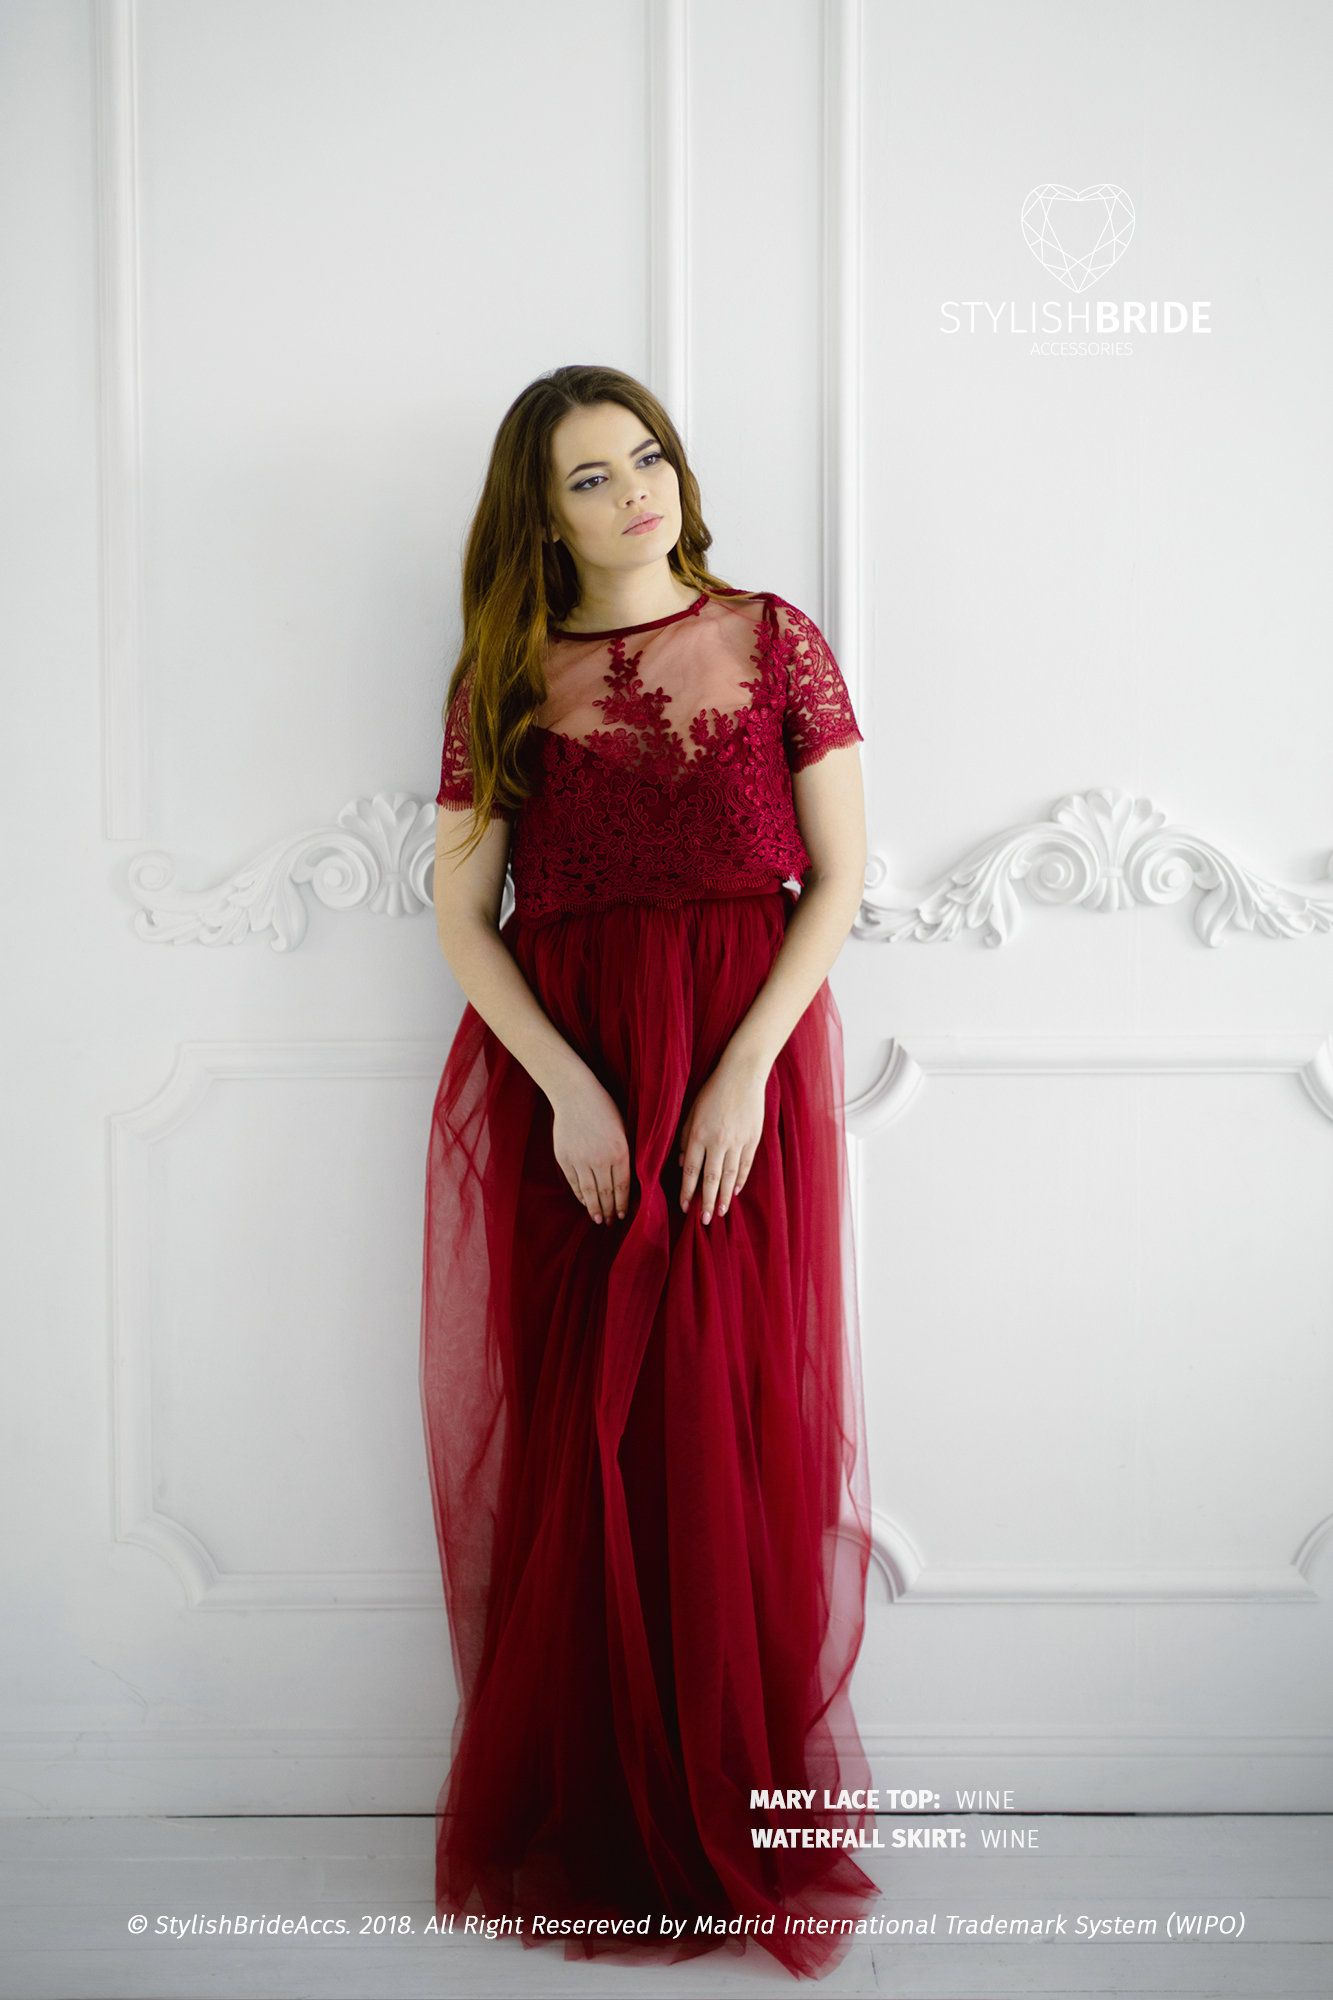 Wine lace mary dress bridesmaids long wine waterfall tulle skirt